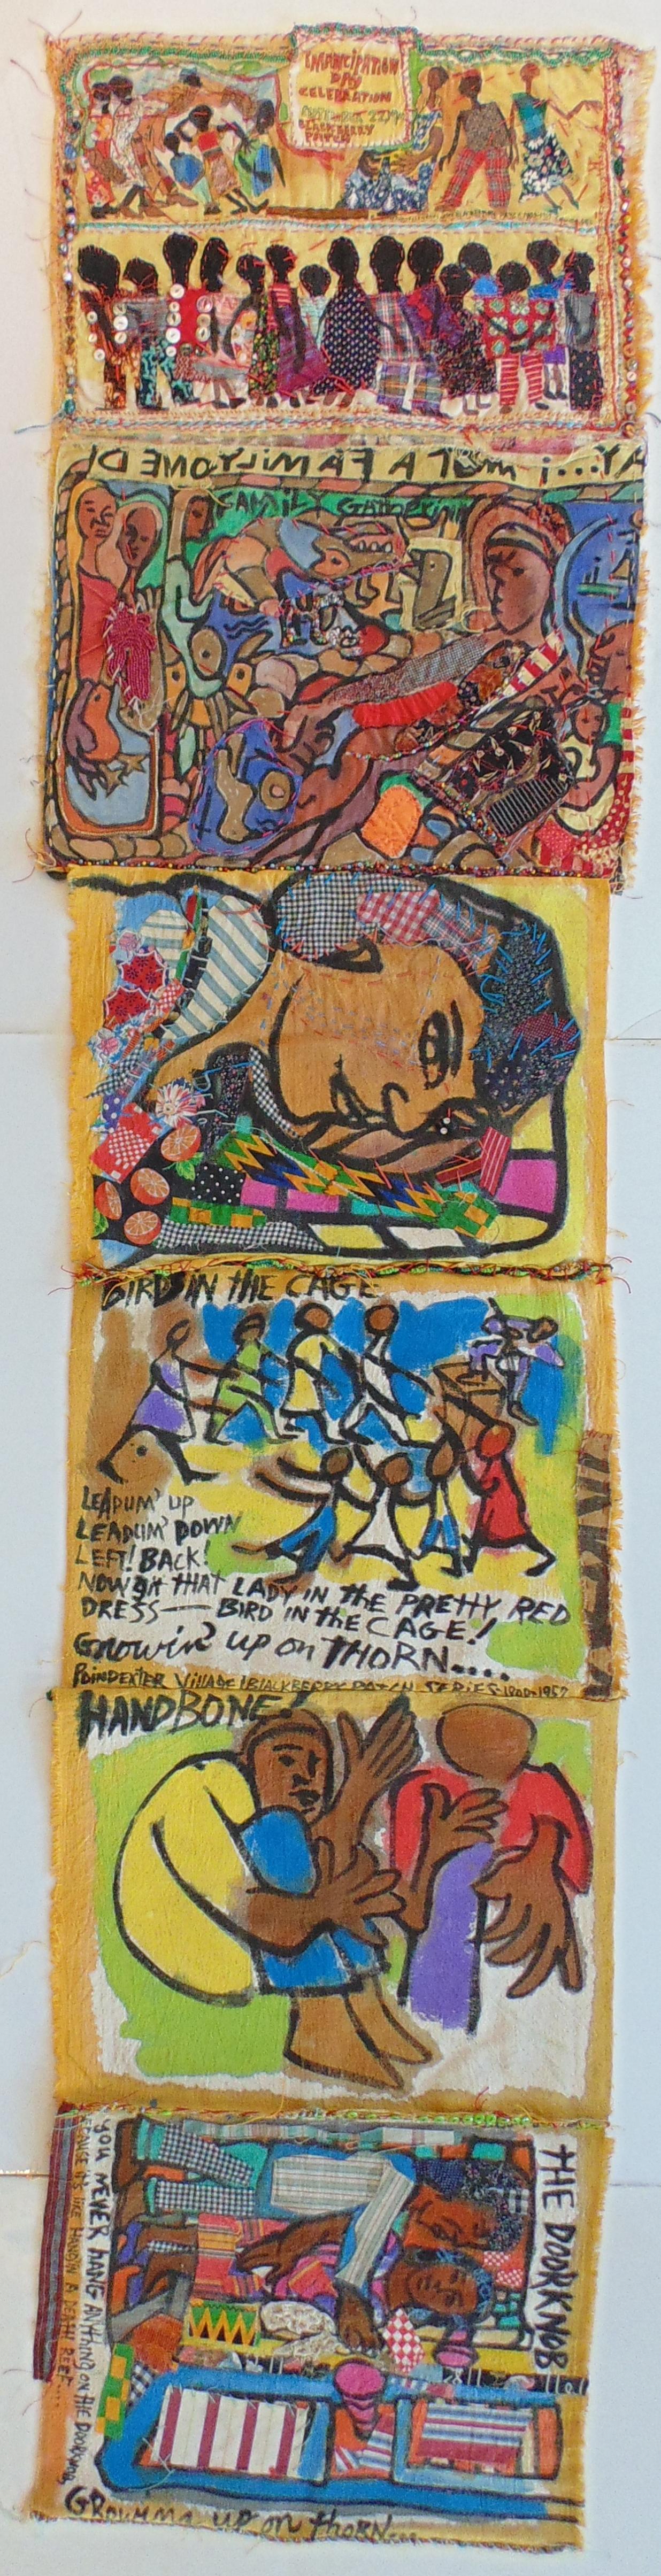 Aminah Robinson - Emancipation Day Celebration